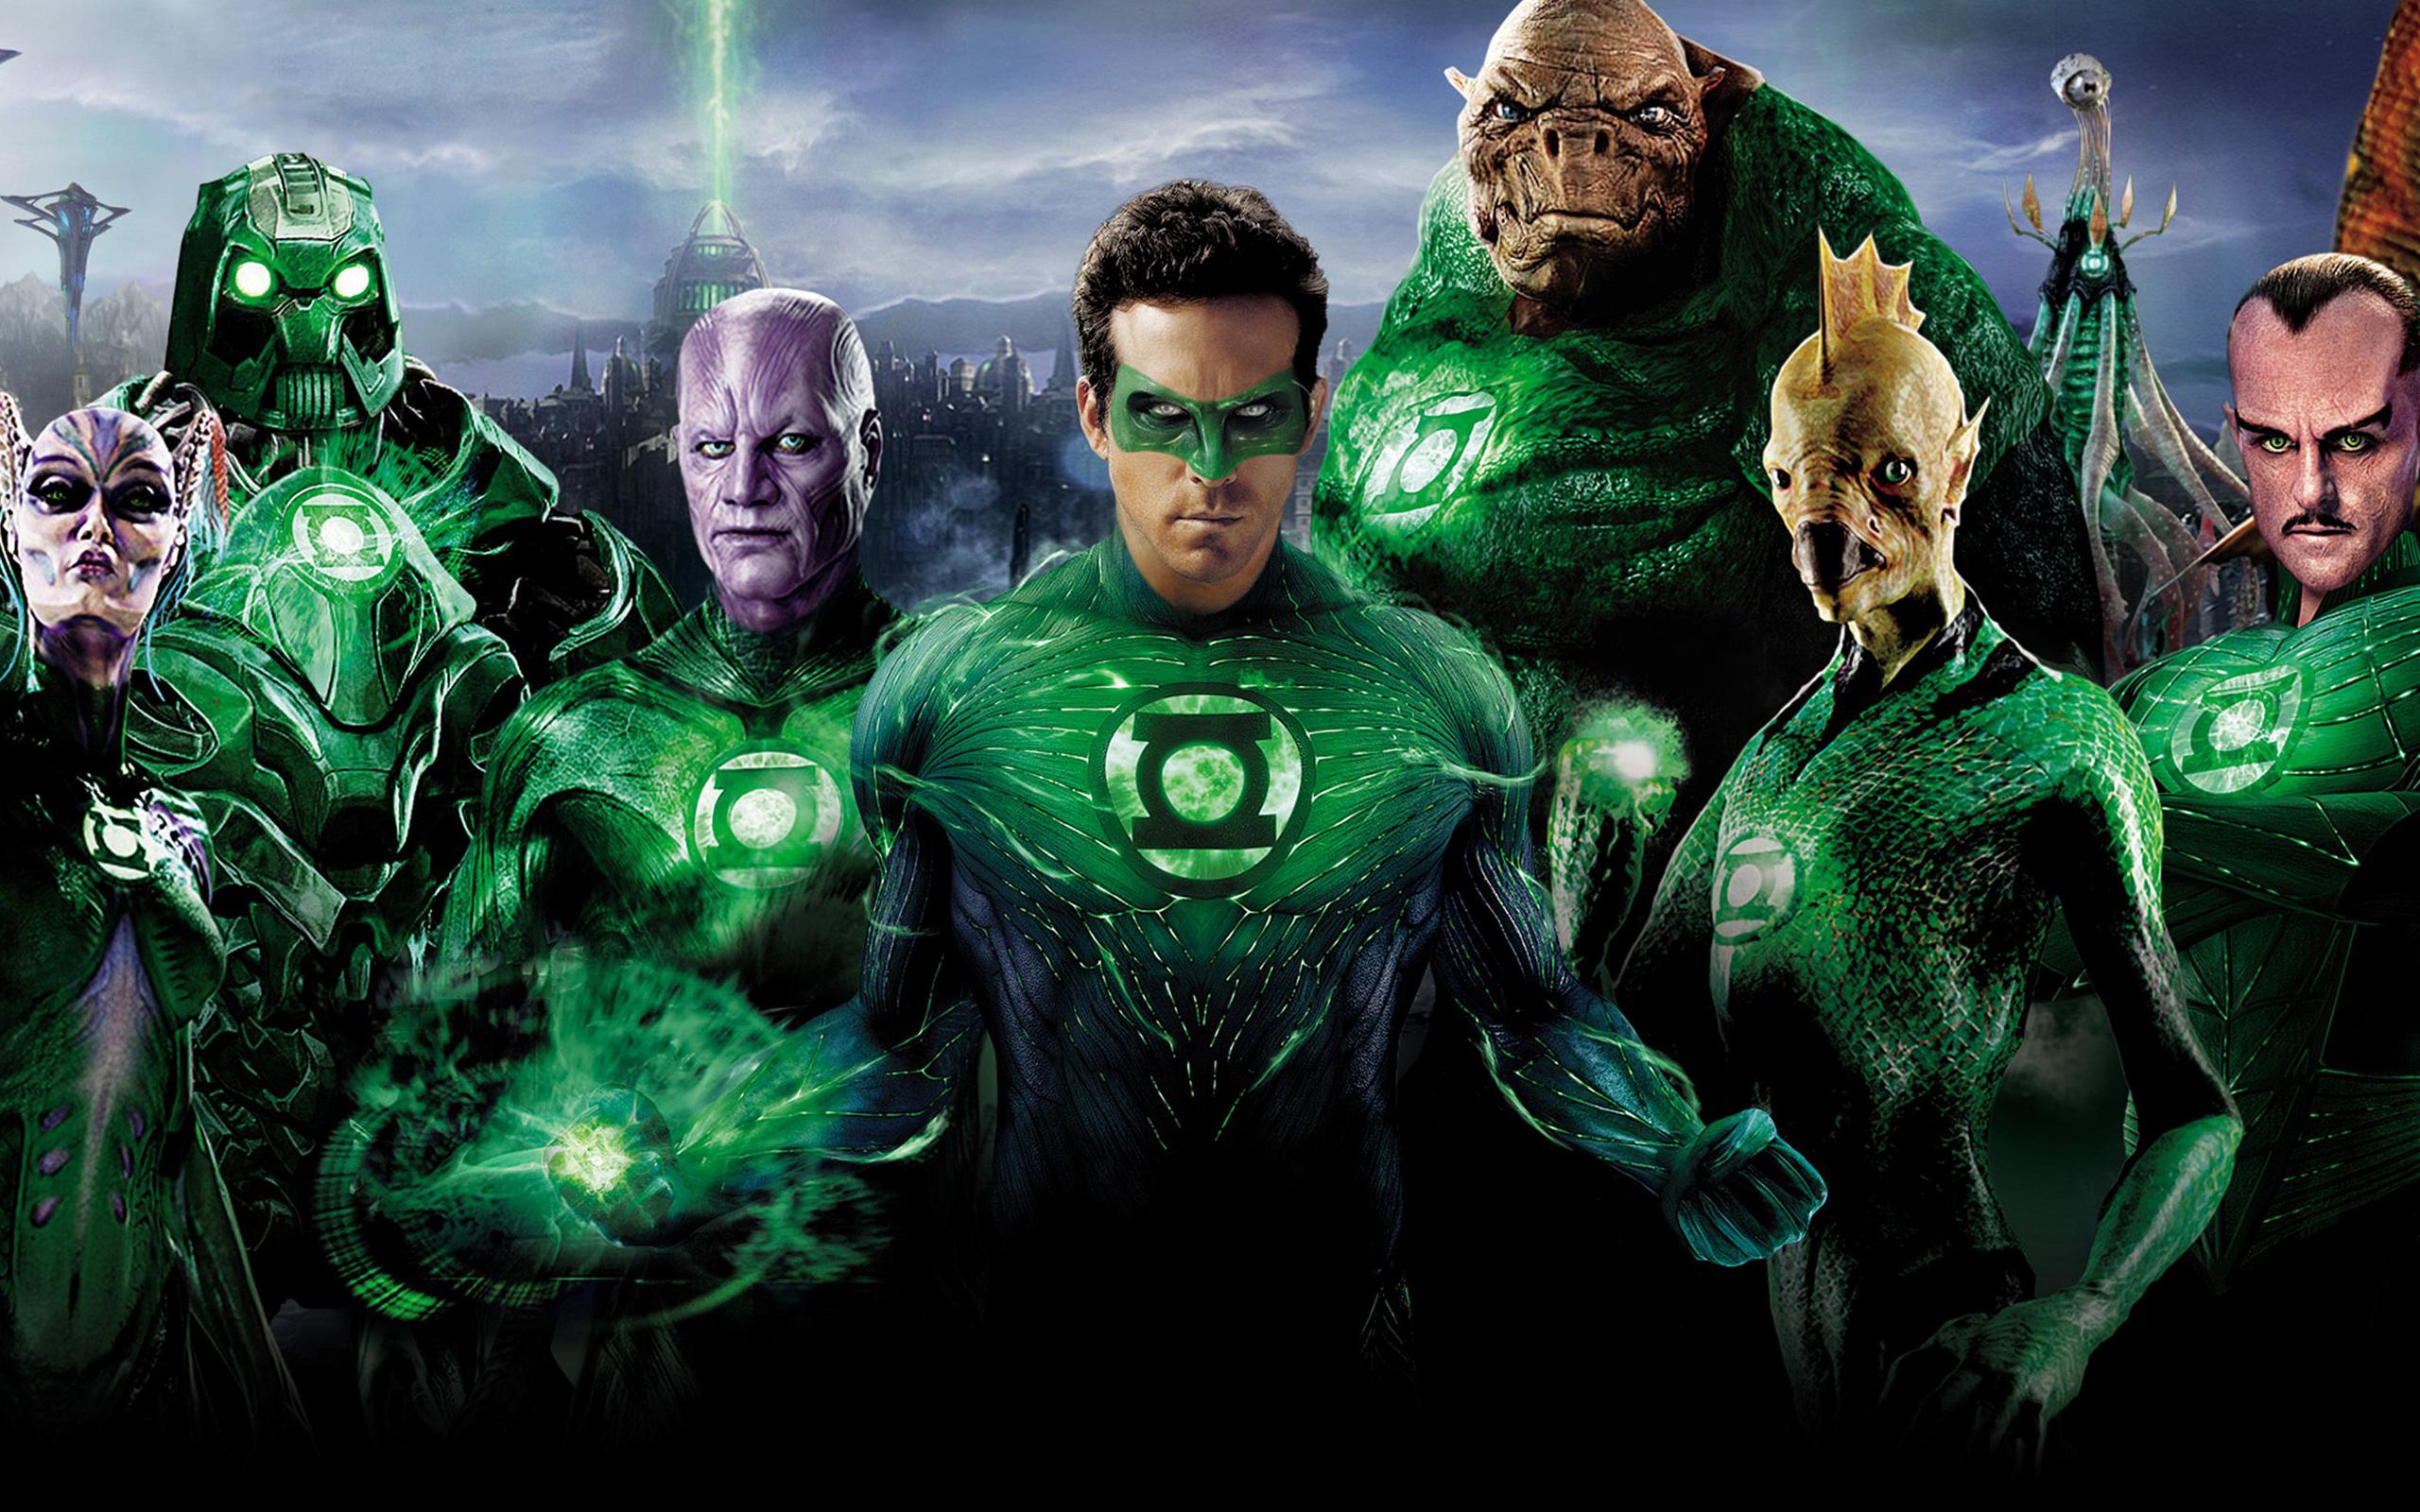 Green Lantern Superheroes Wallpapers HD Wallpapers 2560x1600